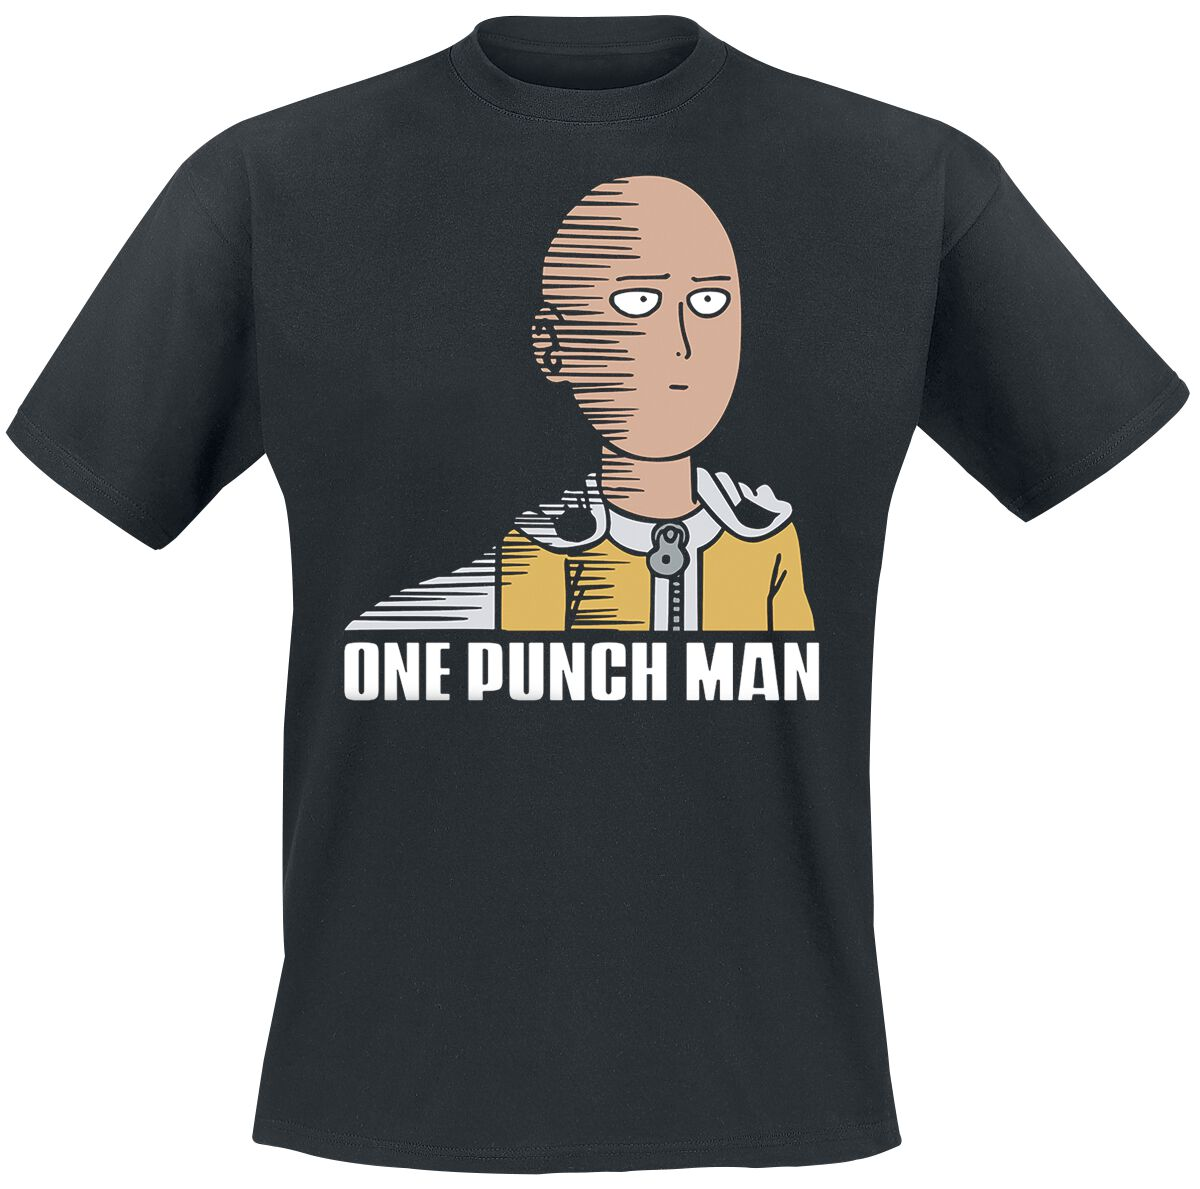 One Punch Man Saitama Fun T-Shirt schwarz ABYTEX420